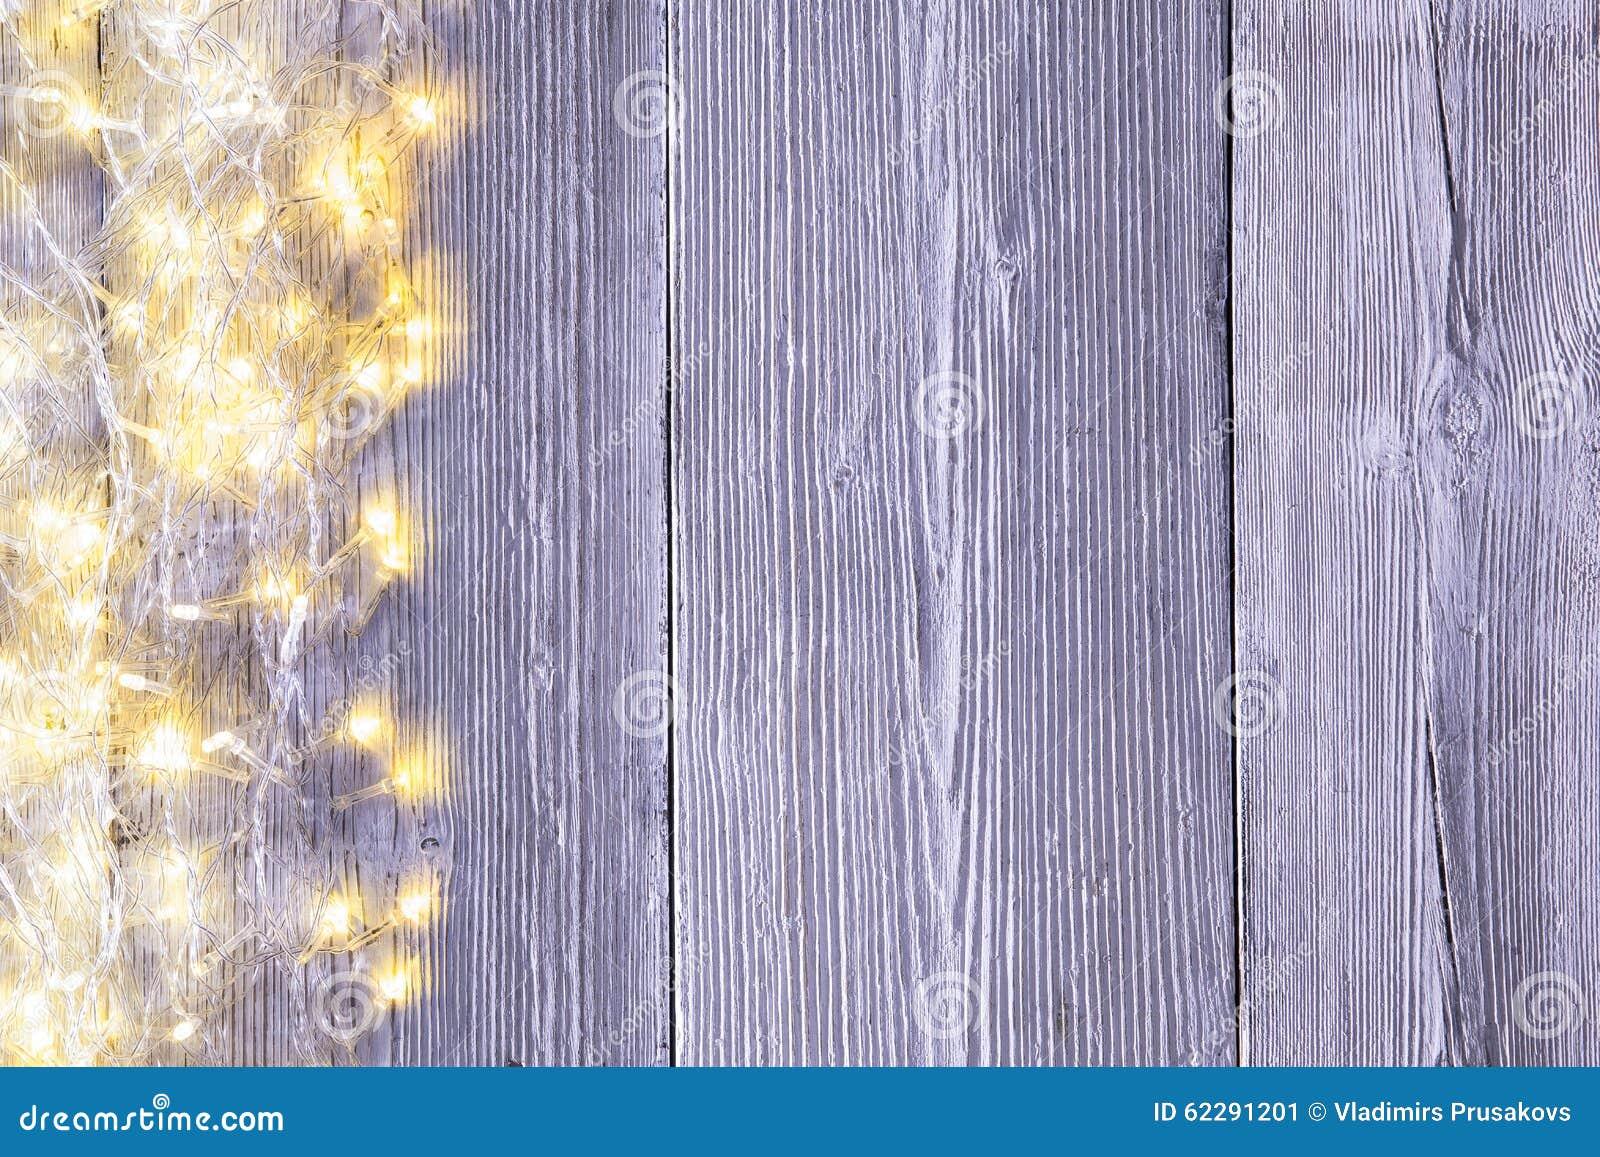 Garland Lights Wood Background Light Wooden Board Texture